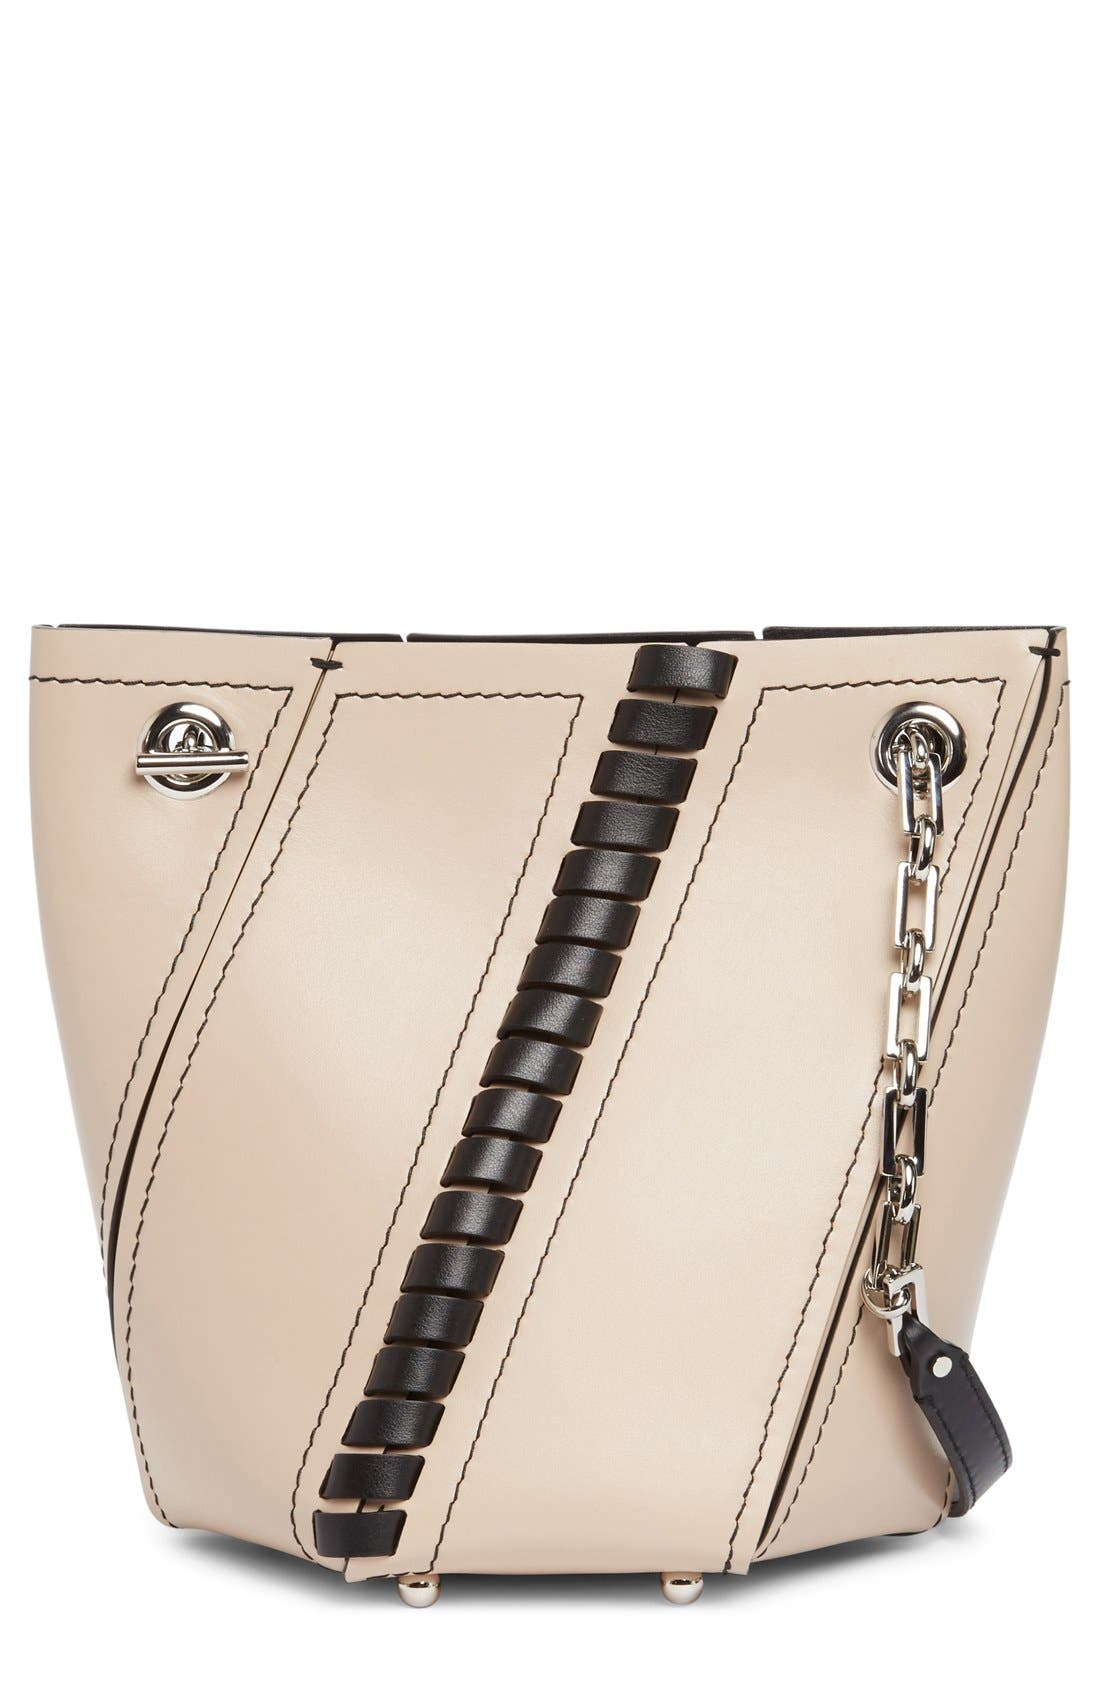 Proenza Schouler Mini Hex Whipstitch Leather Bucket Bag